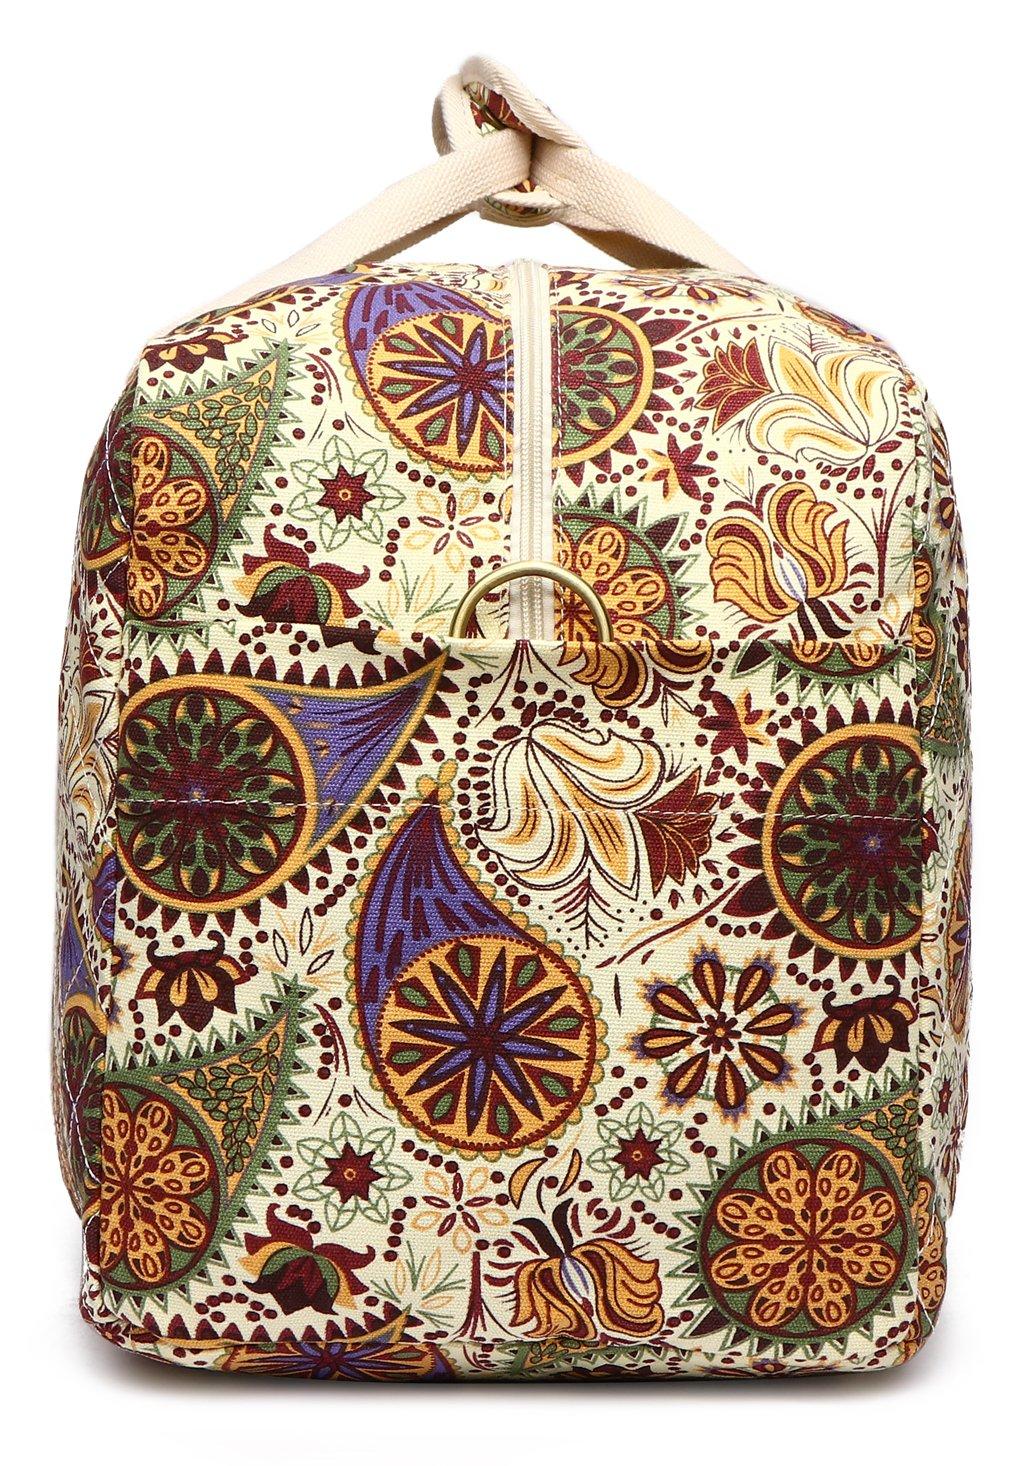 Malirona Canvas Weekender Bag Travel Duffel Bag for Weekend Overnight Trip (Yellow Flower) by Malirona (Image #4)